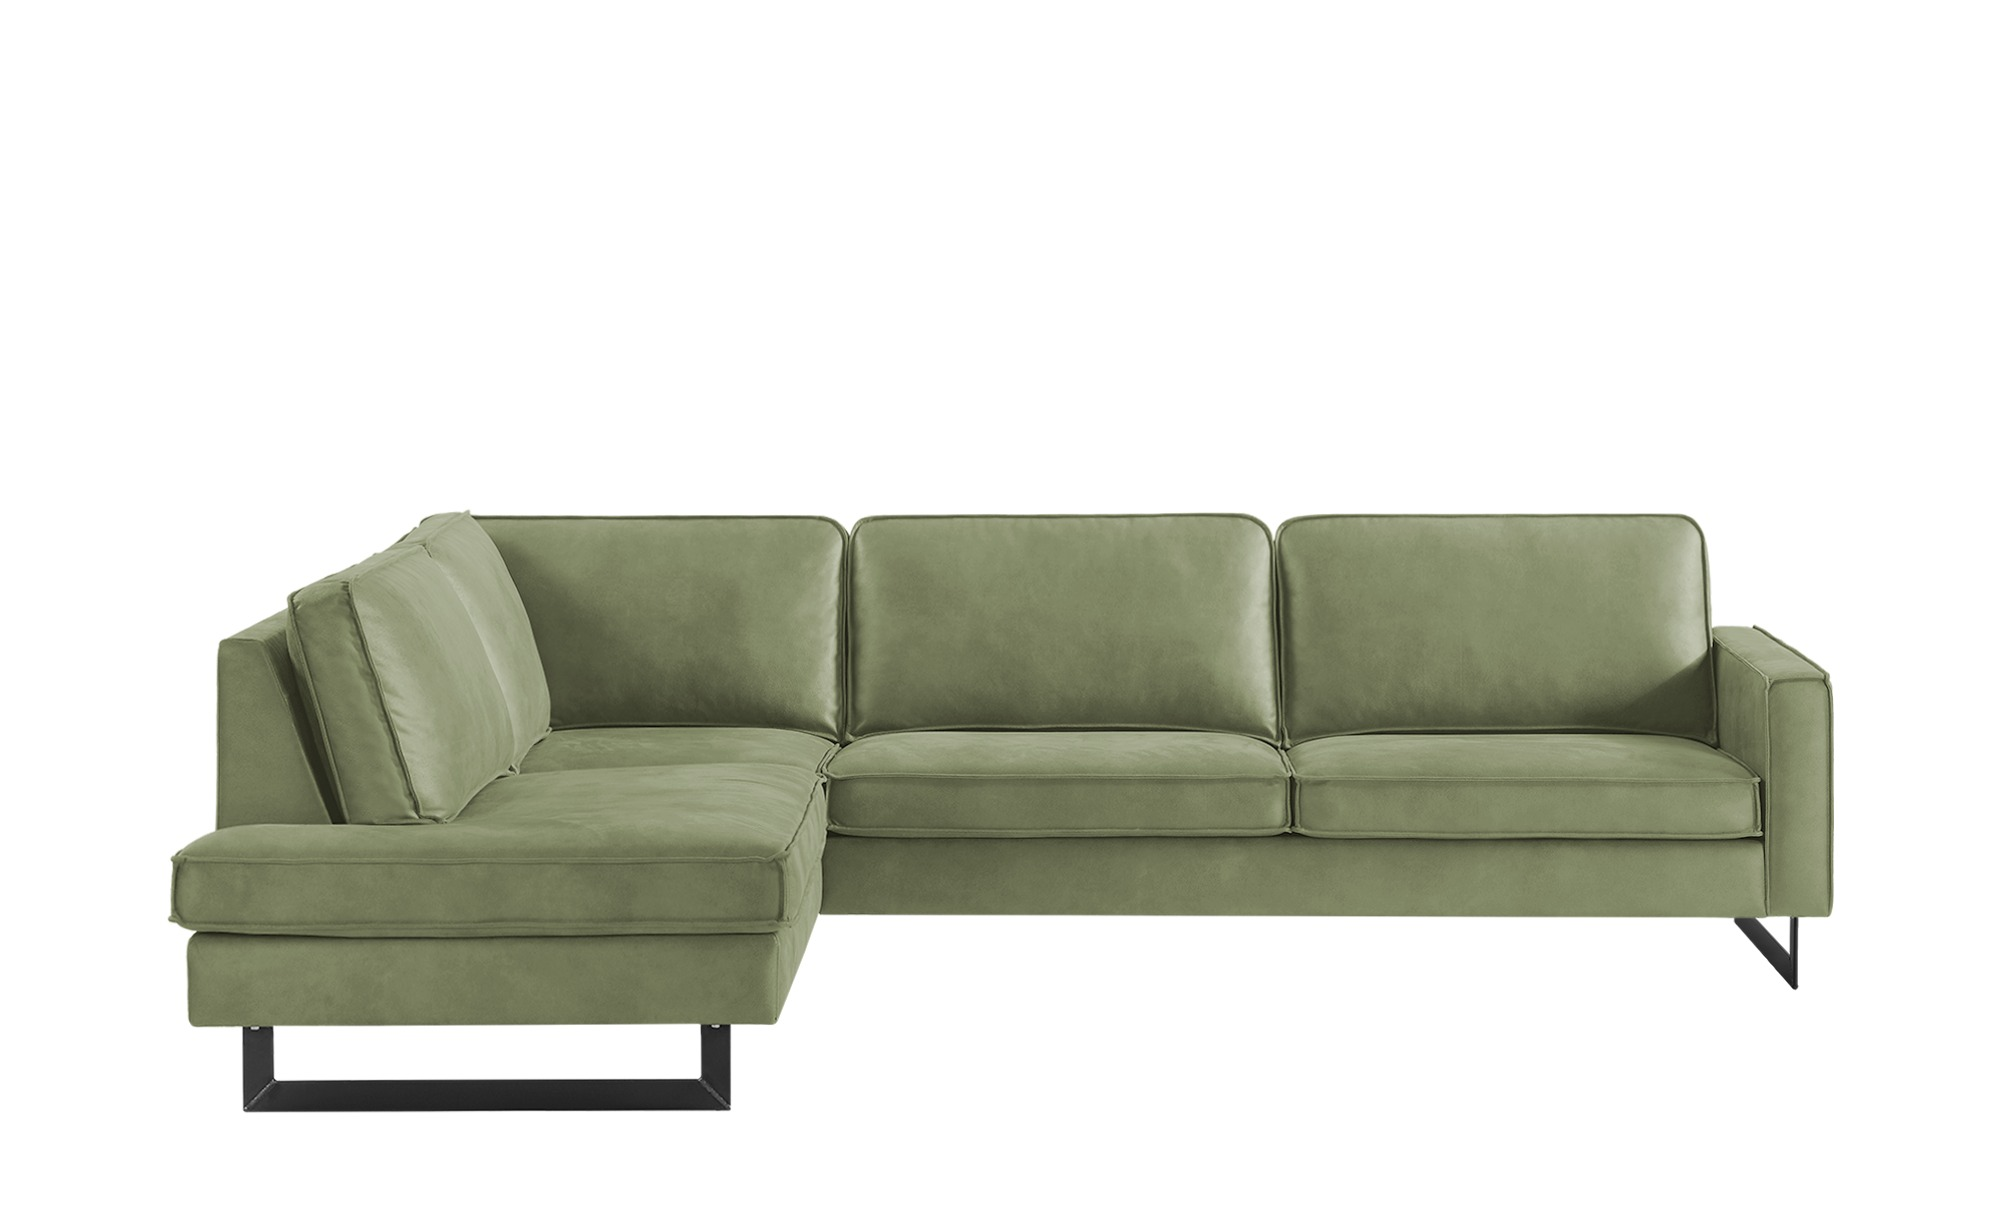 Ecksofa  Pippa ¦ grün ¦ Maße (cm): H: 85 Polstermöbel > Sofas > Ecksofas - Höffner